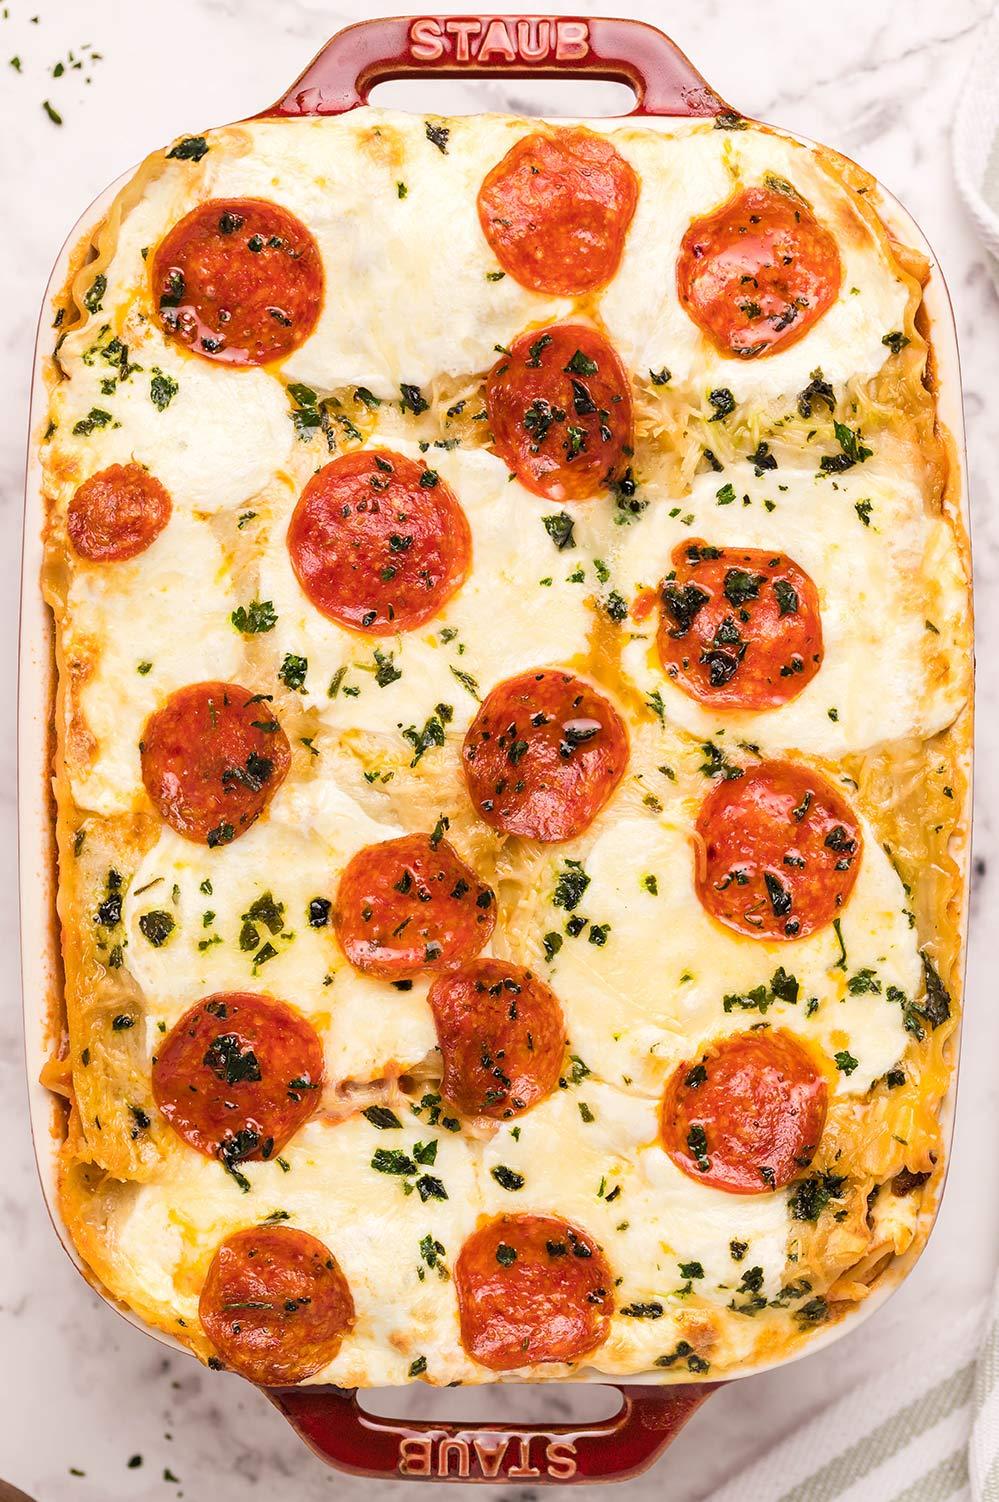 pizza lasagna in a red casserole